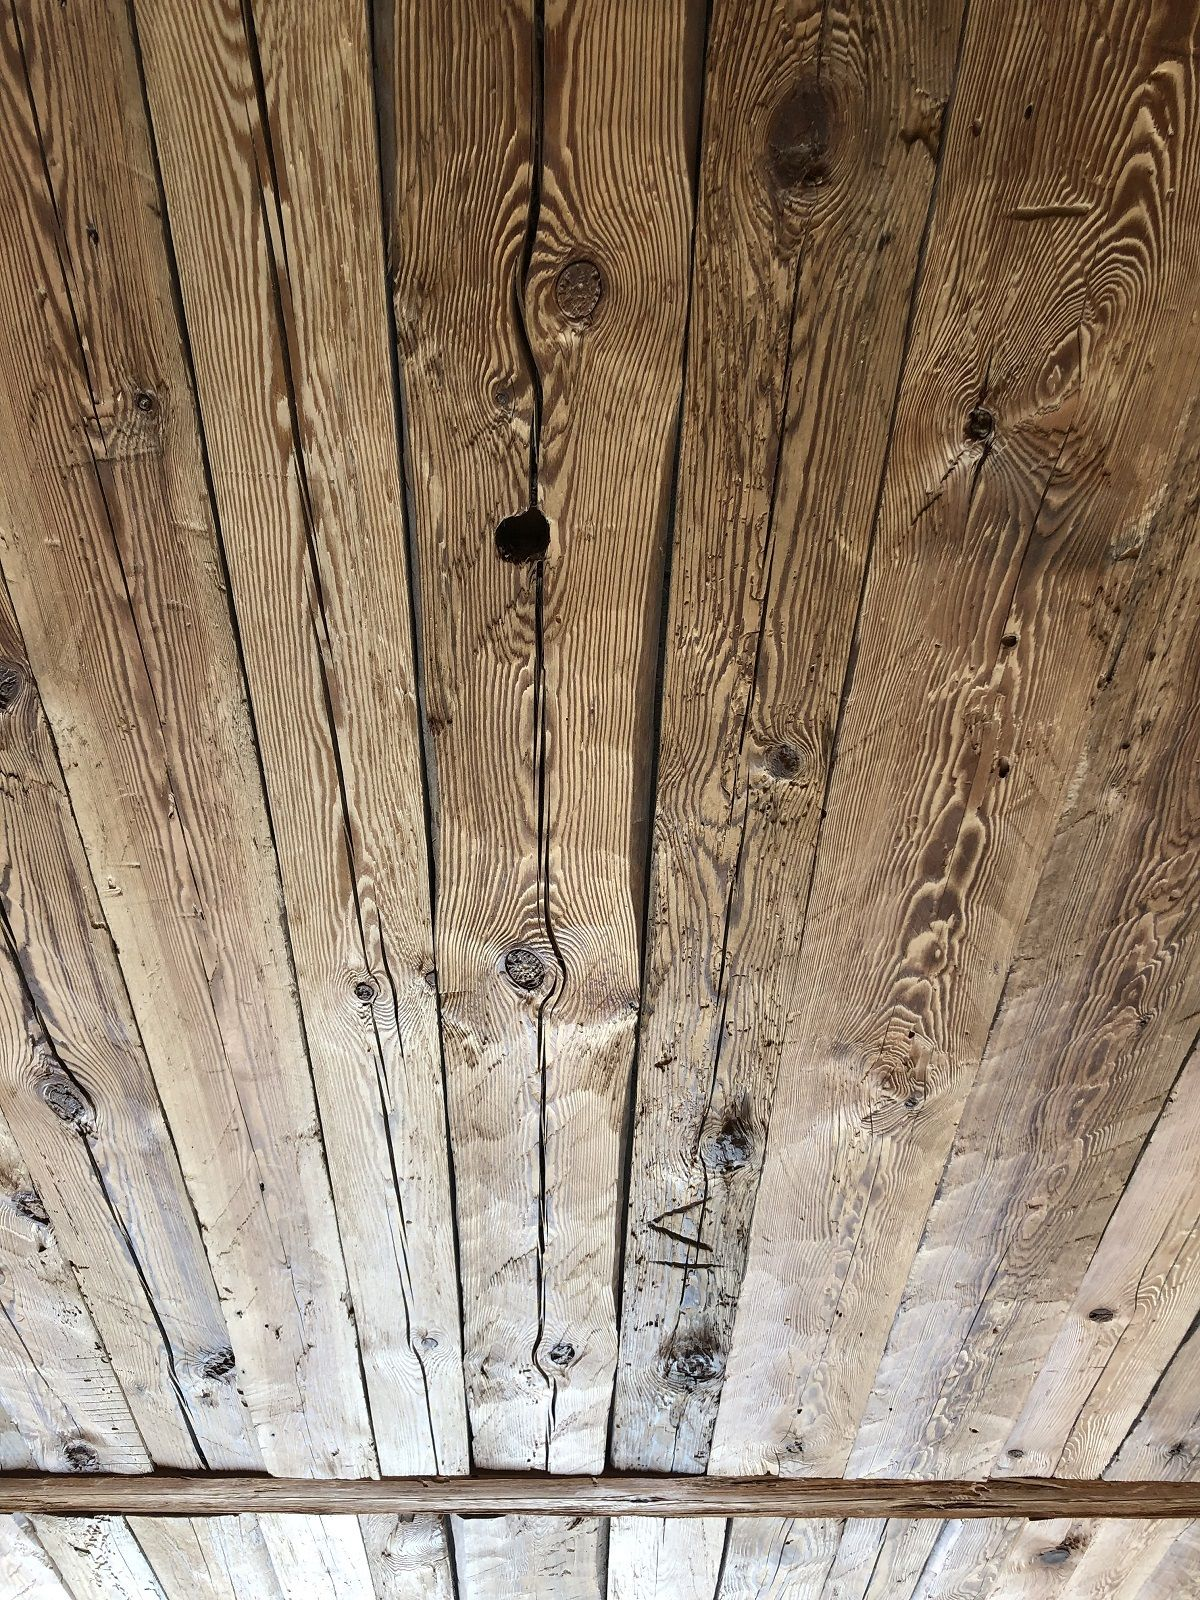 Rustikale Wandverkleidung Handgehackte Altholz Bretter Vintage Holz In 2020 Vintage Holz Wandverkleidung Altholz Wandverkleidung